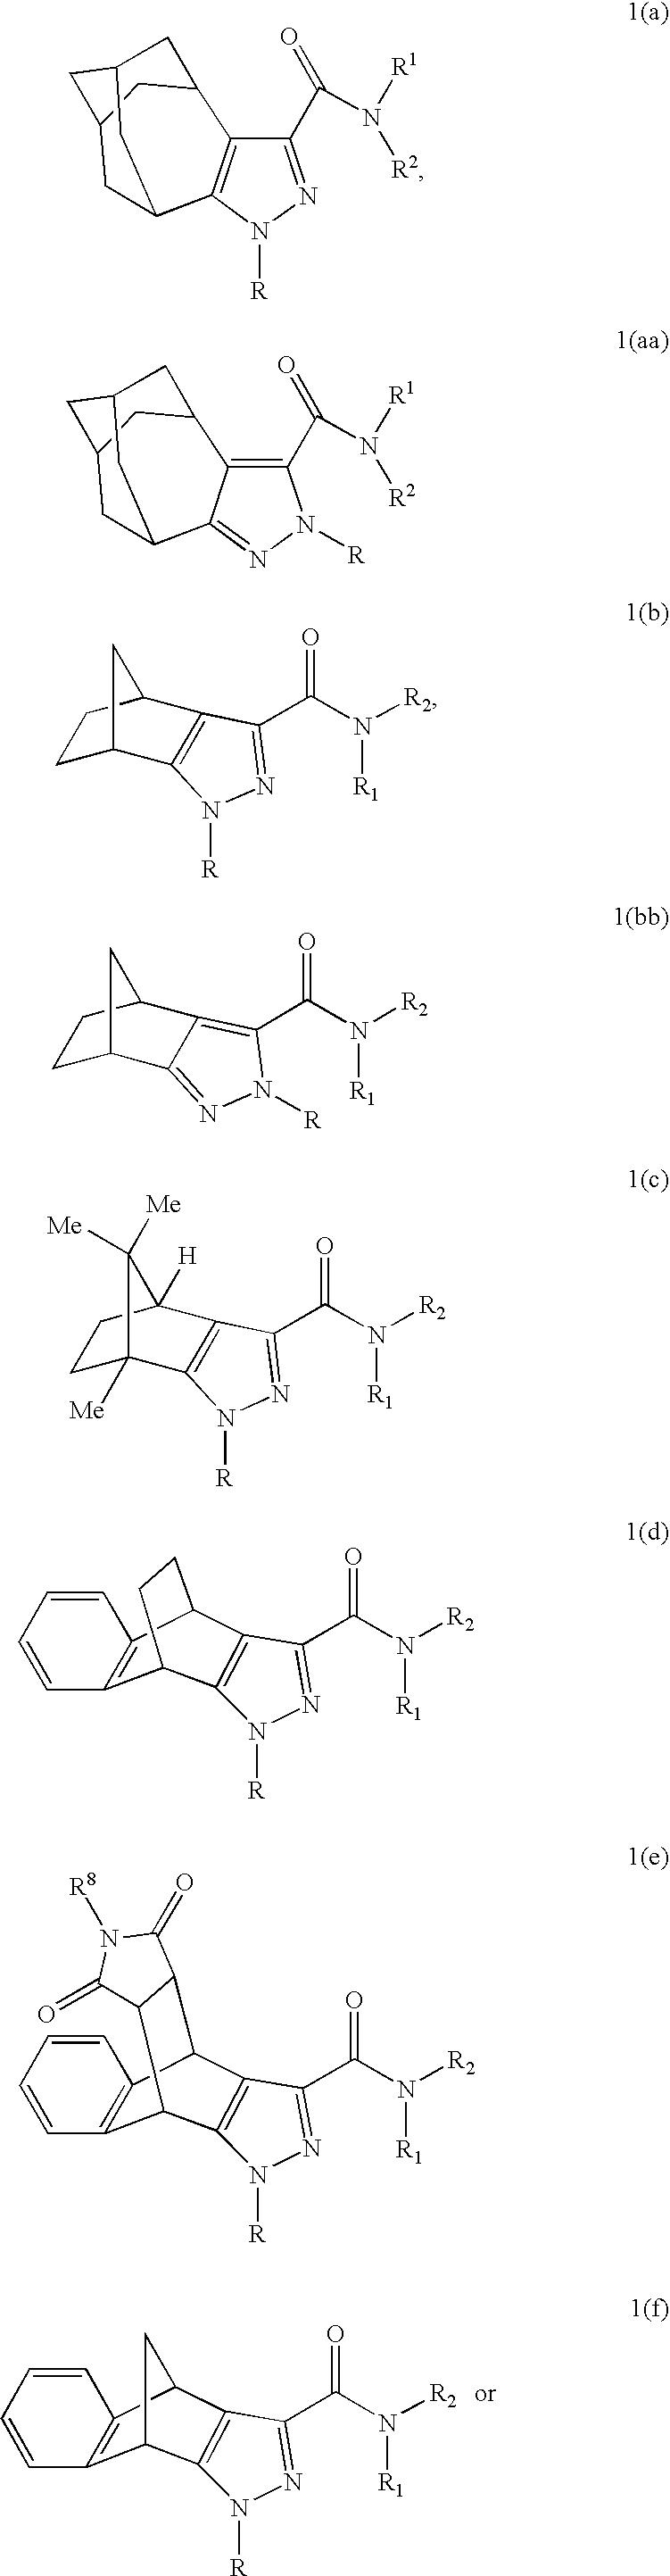 US20080234259A1 - Novel Cannabinoid Receptor Ligands, Pharmaceutical on